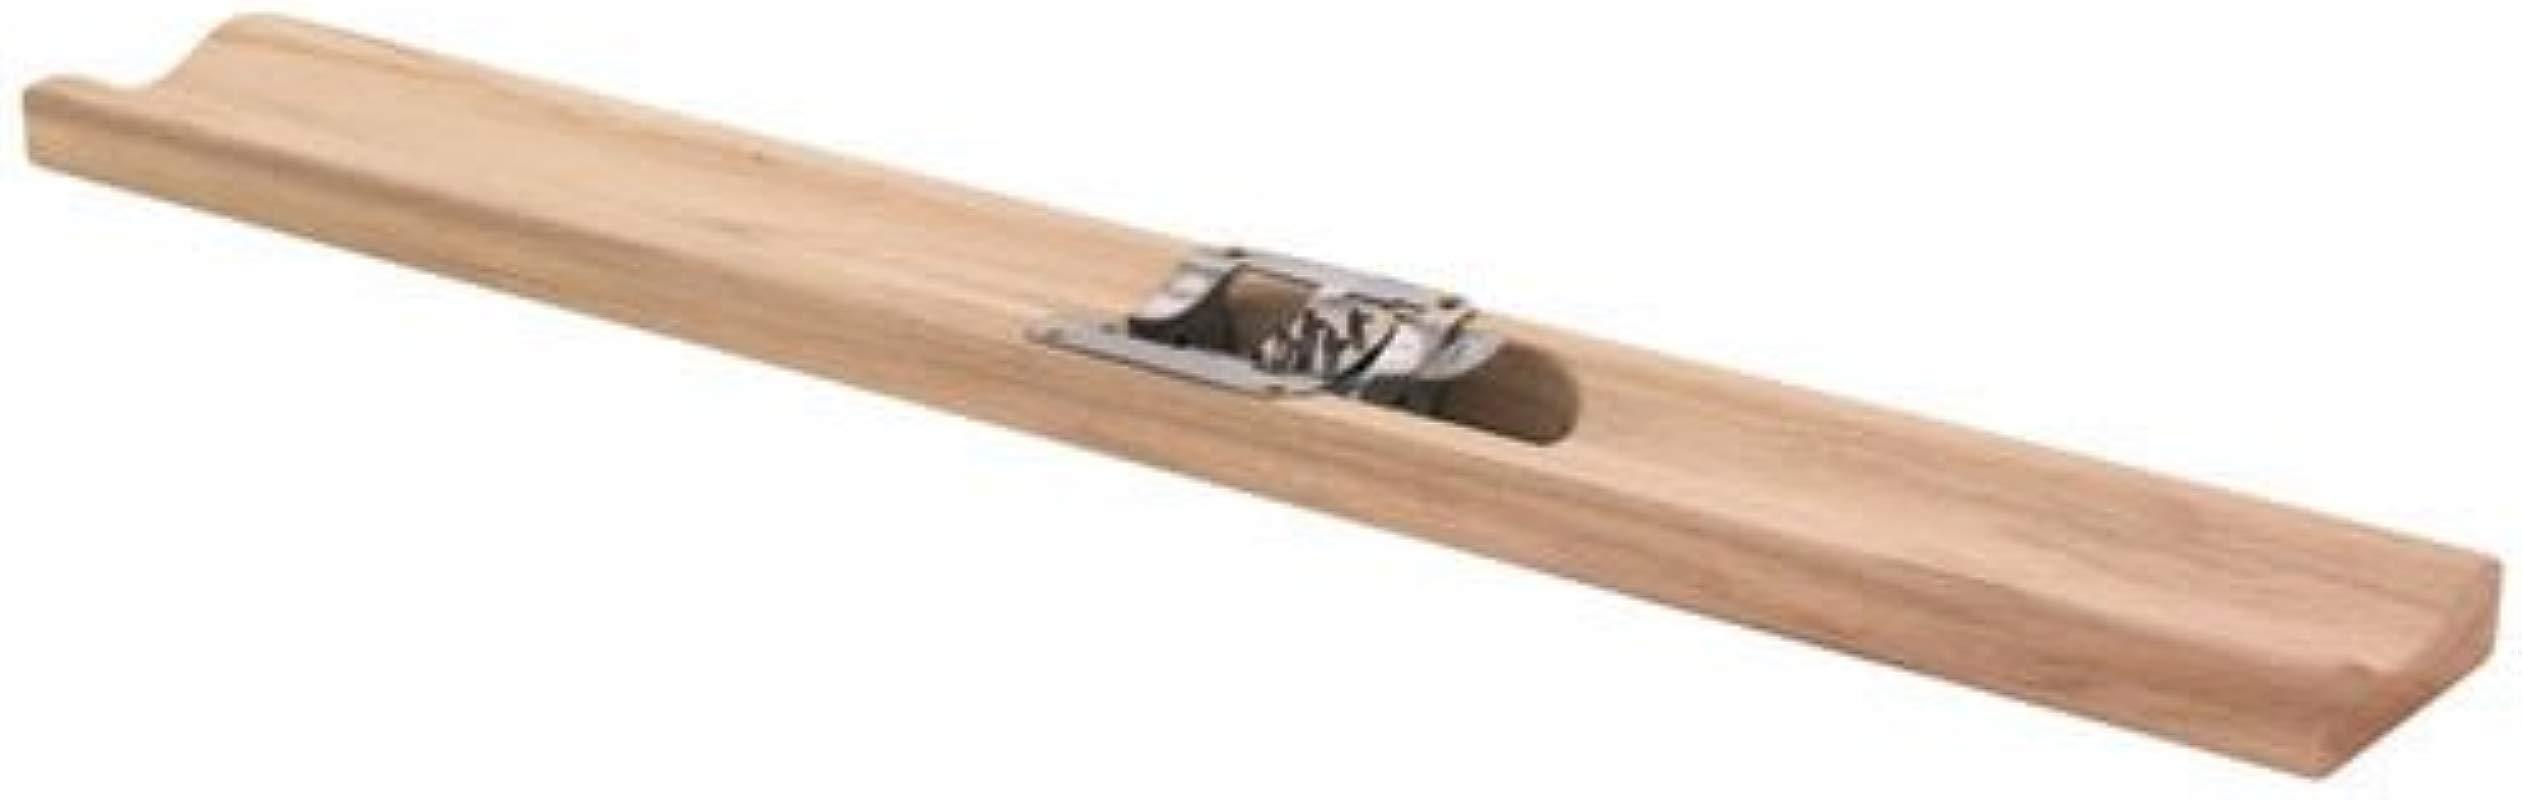 Harold Import Company 101 P Lee Adjustable Wooden Corn Cutter